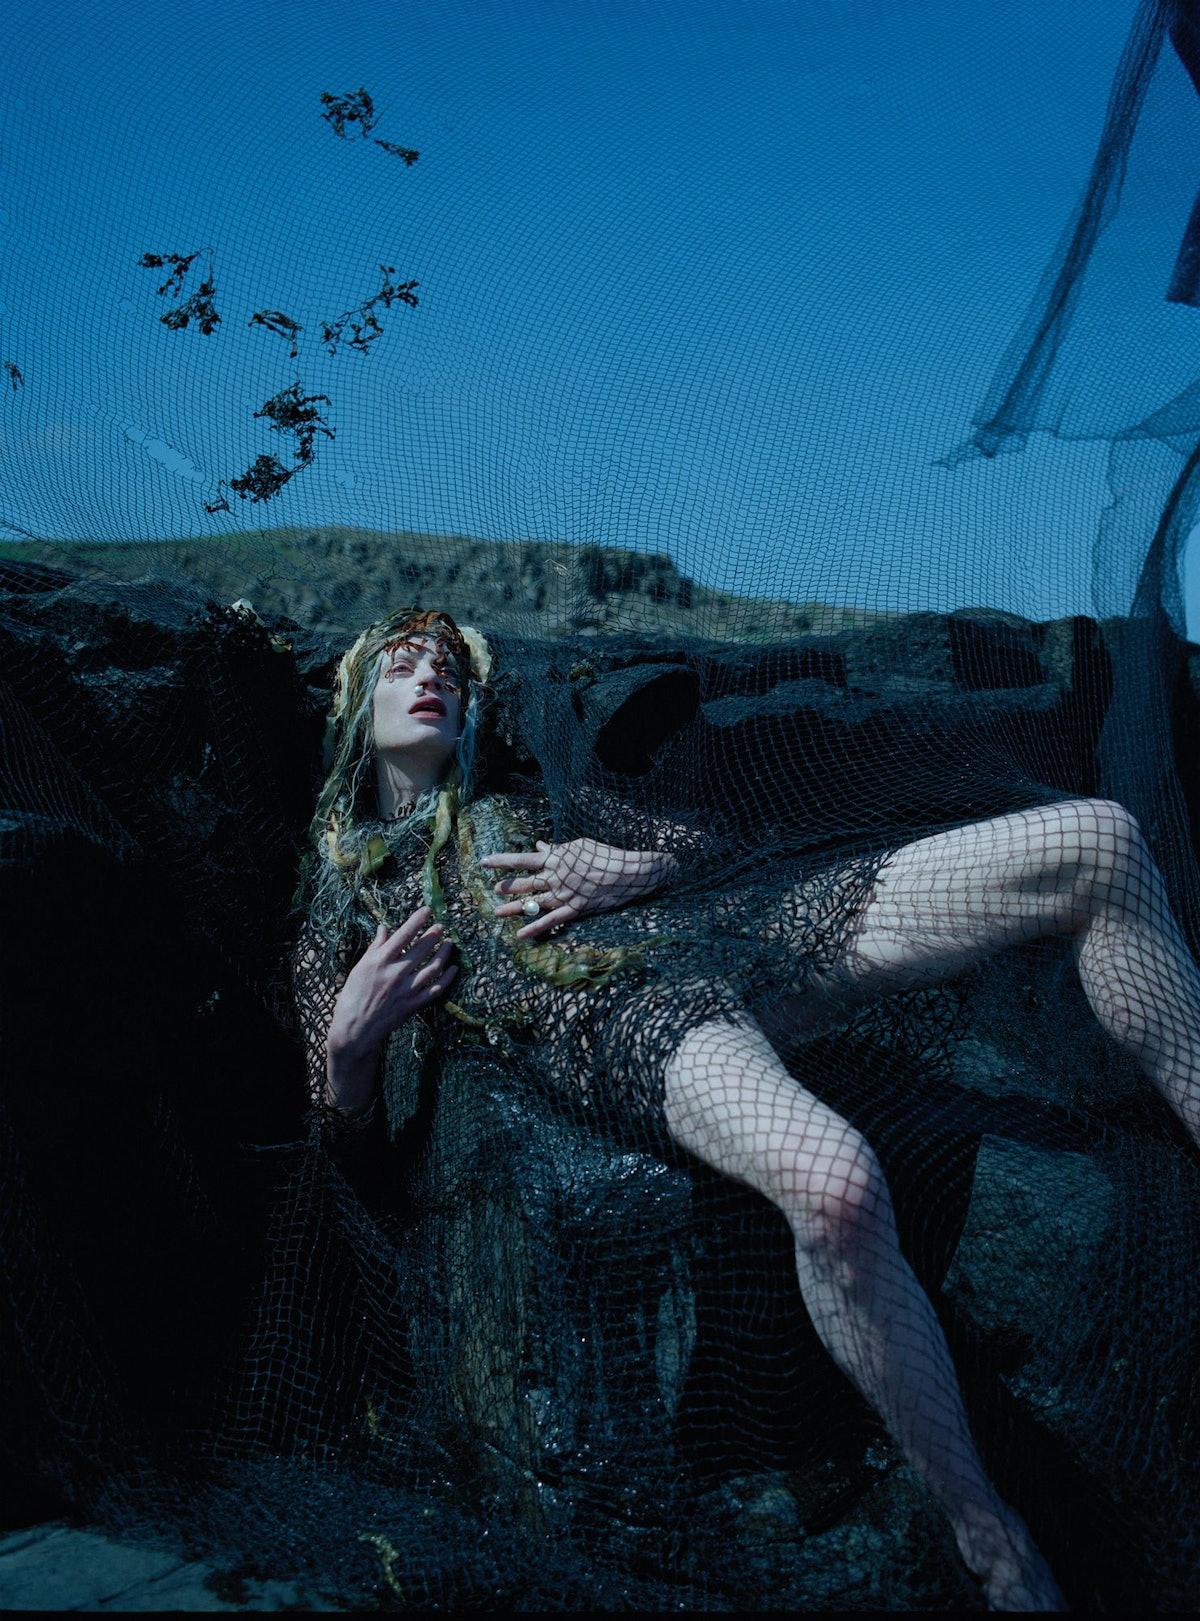 kristen-mcmenamy-mermaid-lede.jpg